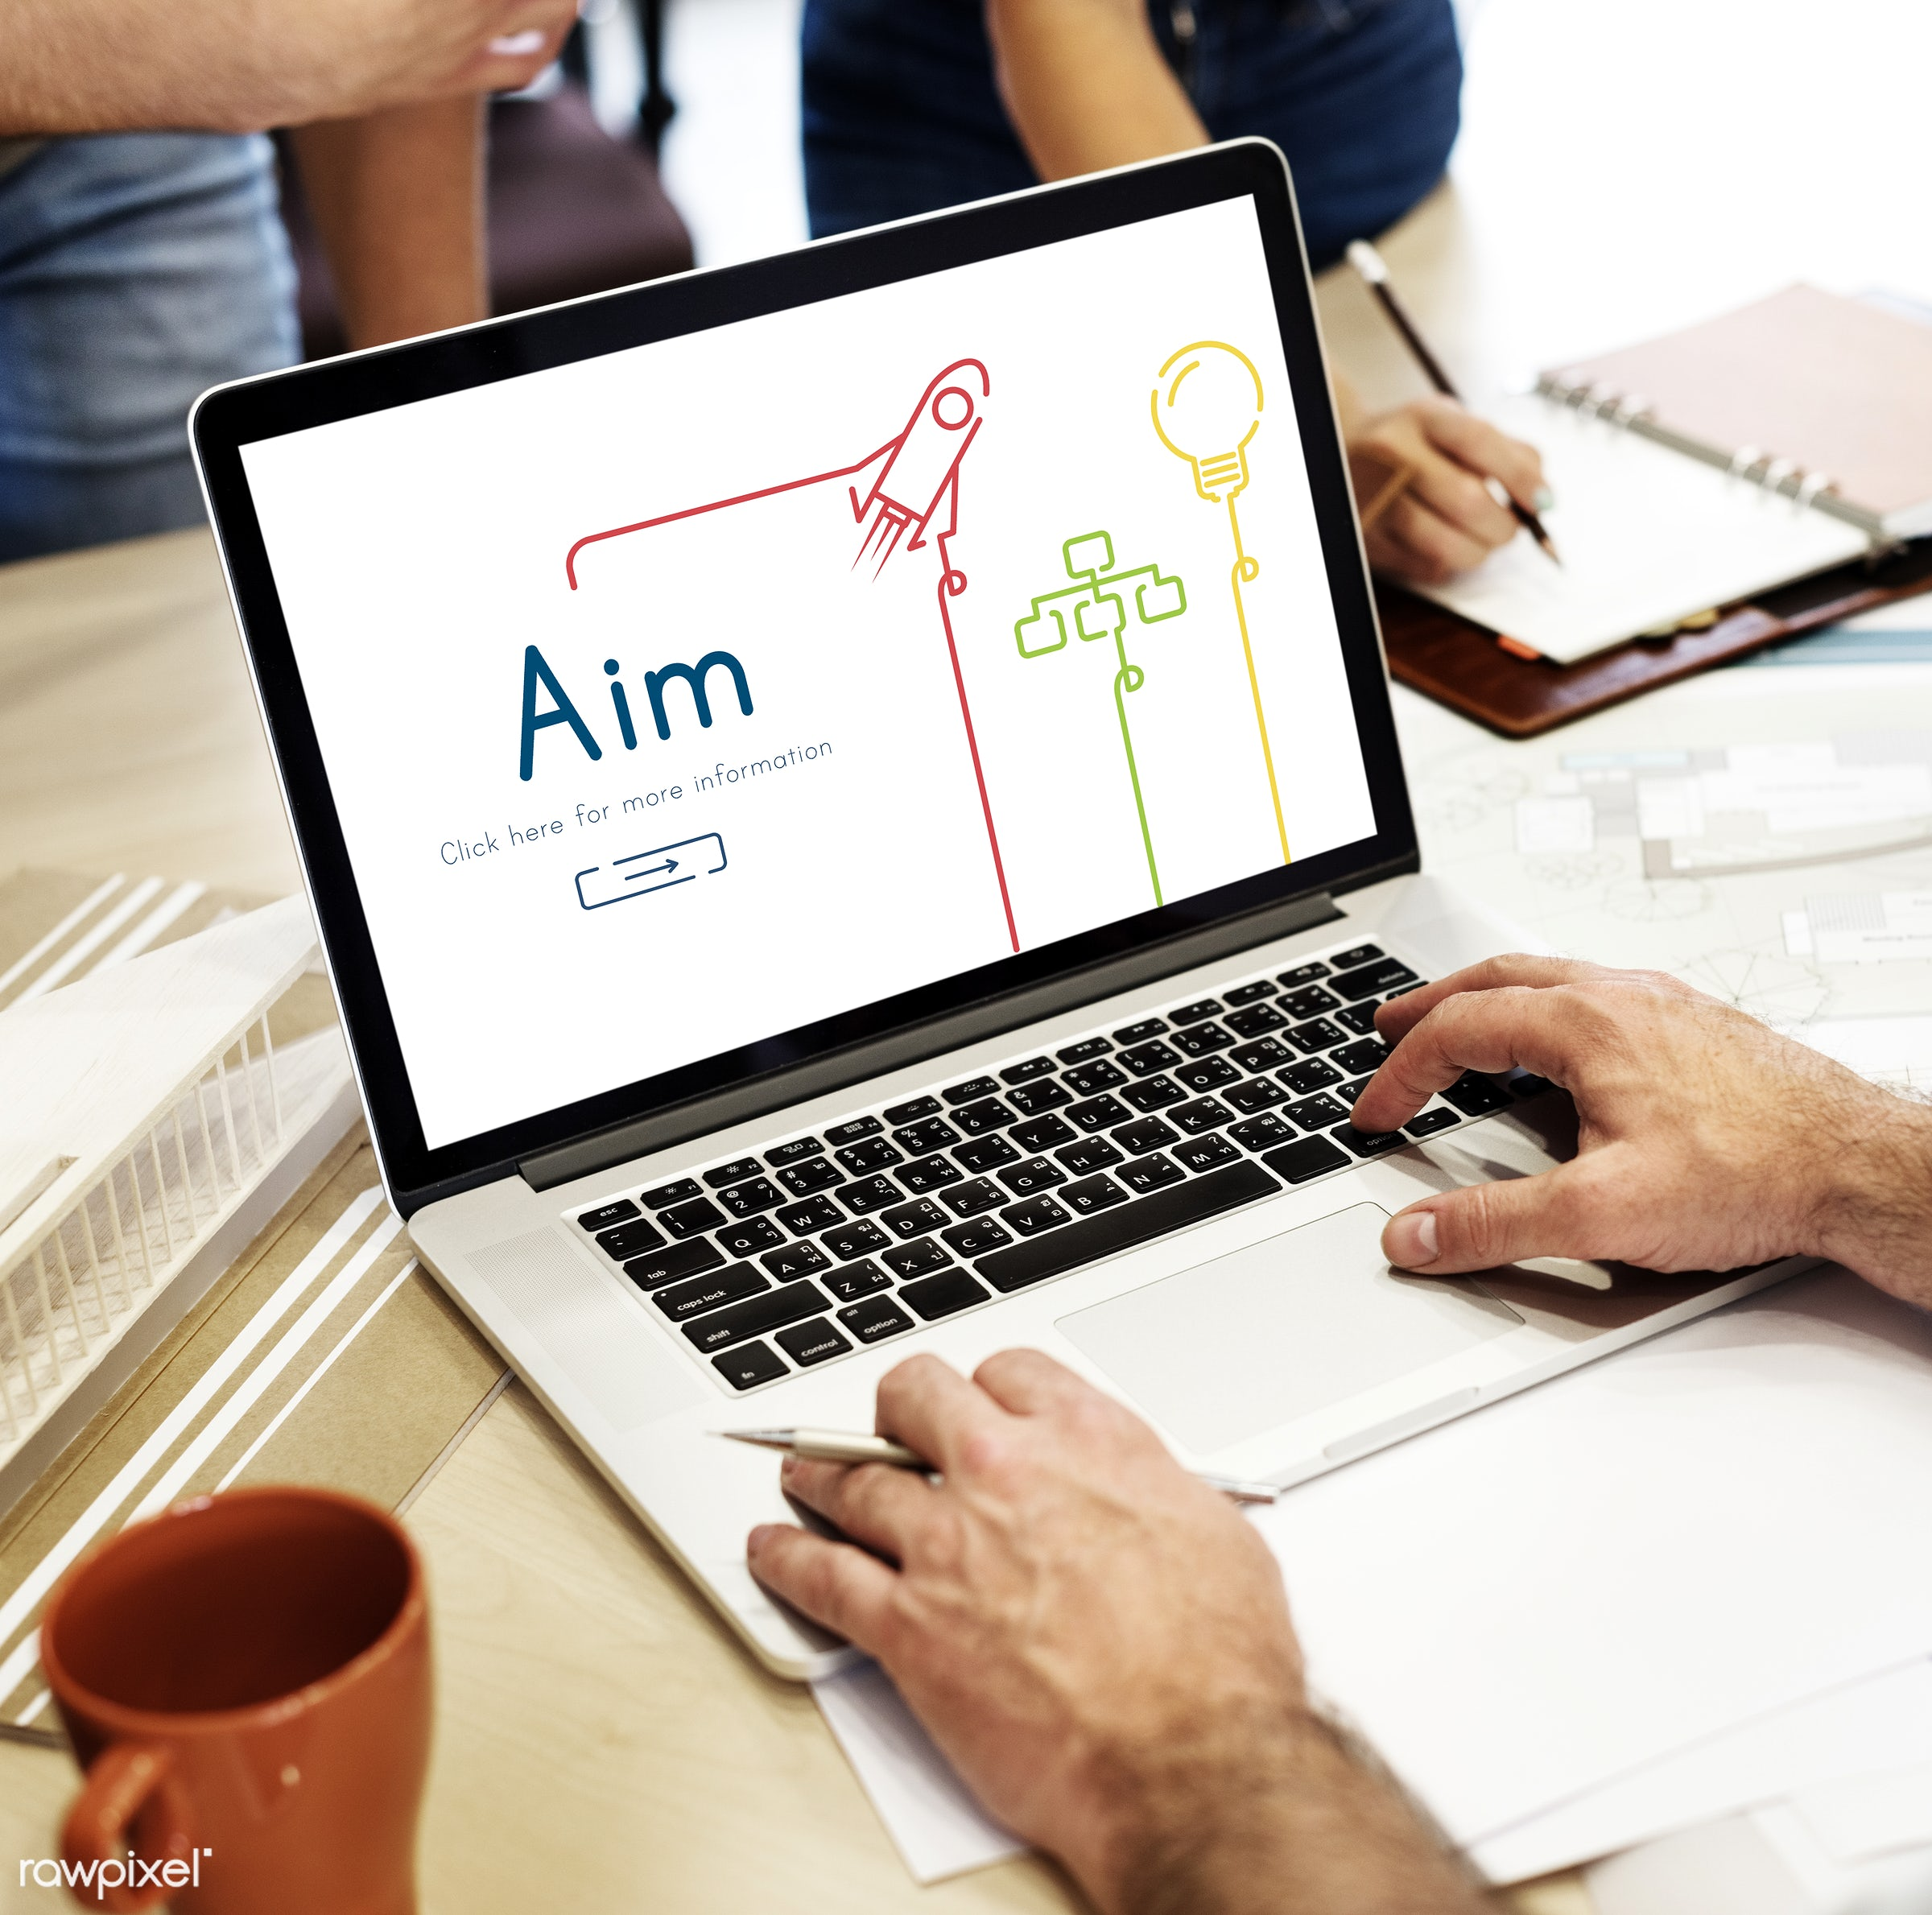 aim, anticipation, architect, architecture, art, aspiration, believe, blueprint, coffee, coffee cup, confidence, cup, design...